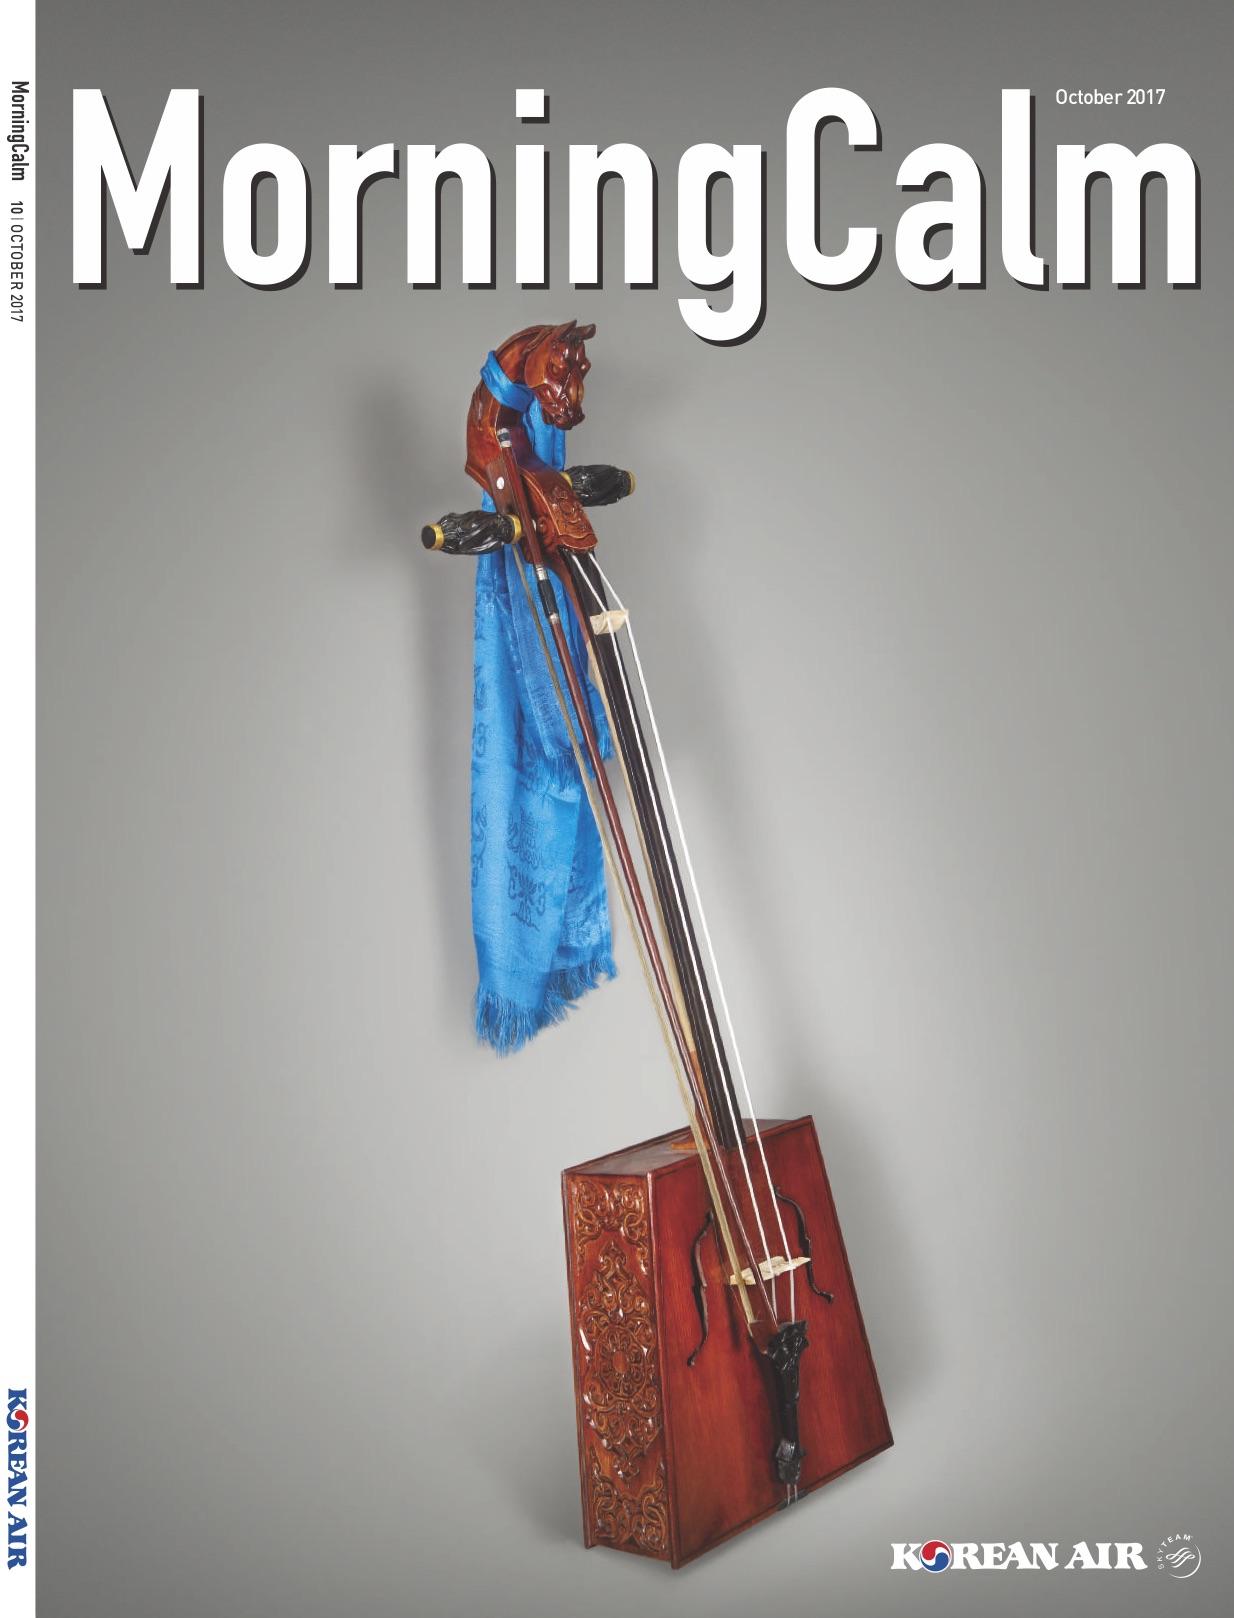 Morning Calm magazine cover